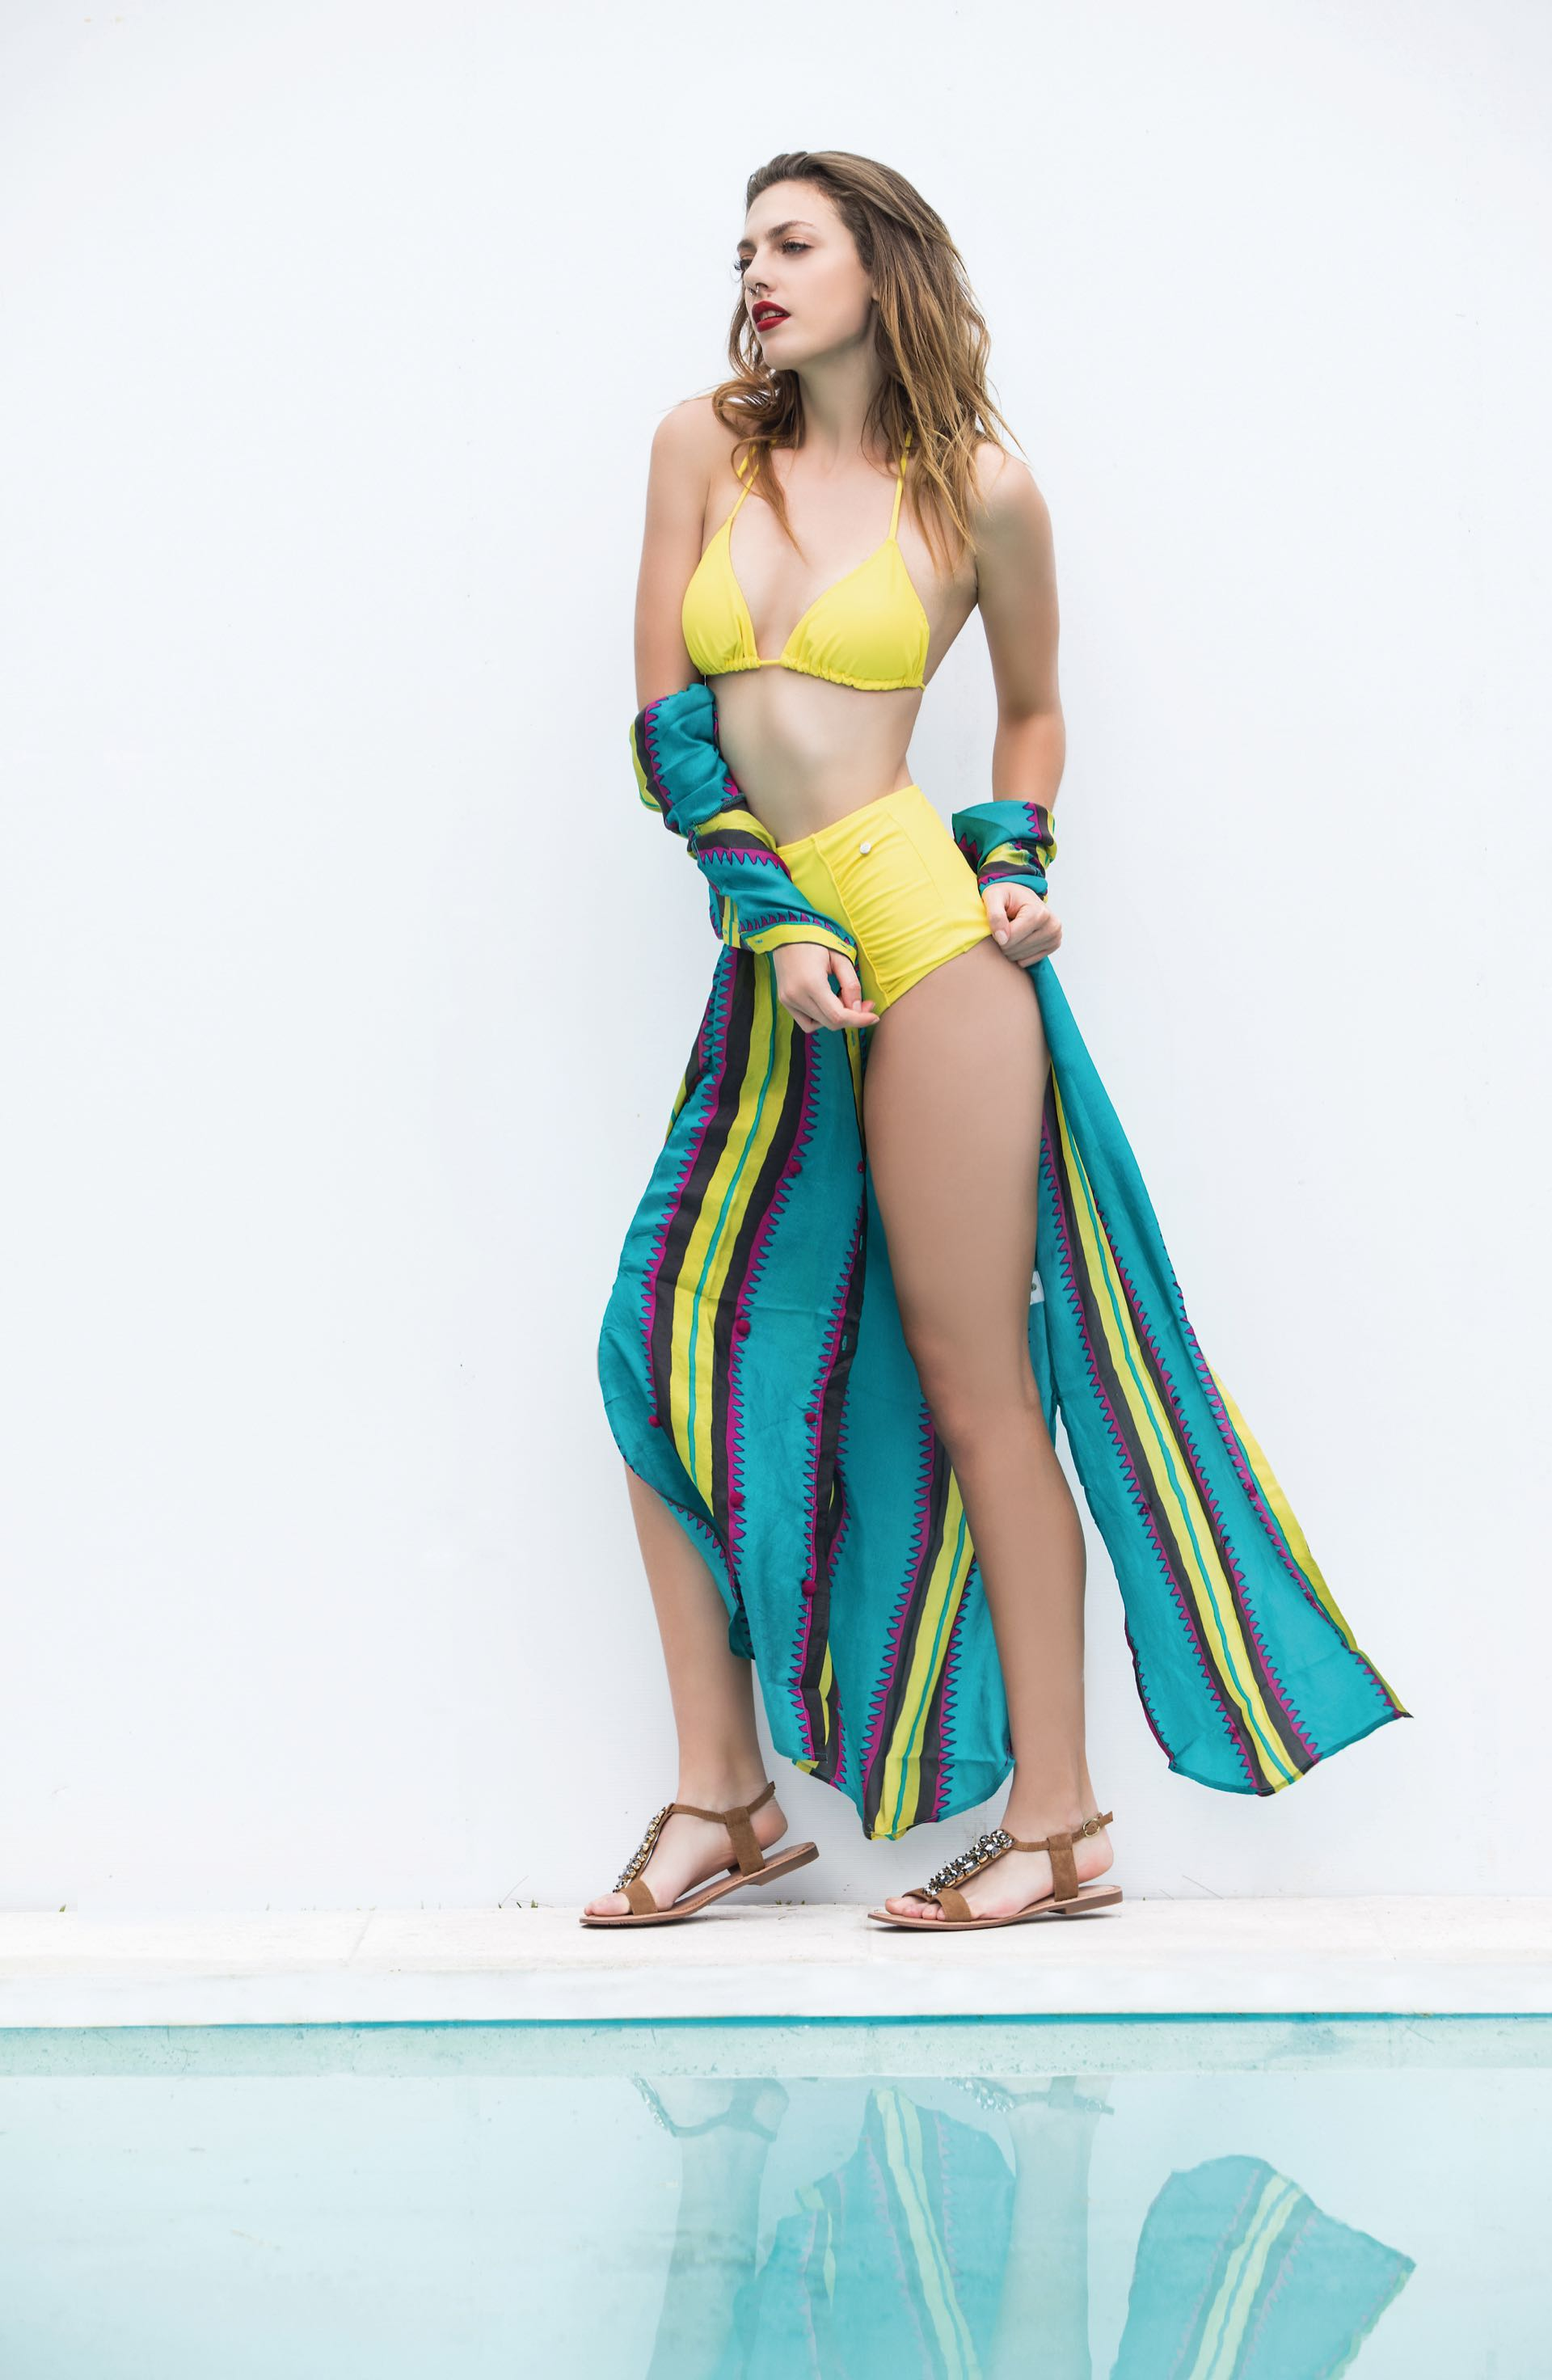 Bikini con corpiño de triangulitos y culotte de tiro alto ($ 1.605, Cipitria), camisa larga de seda estampada($ 4.400, Rapsodia) y sandalias con apliques ($ 1.900, Hush Puppies). Foto Fernando Venegas/ Para Ti